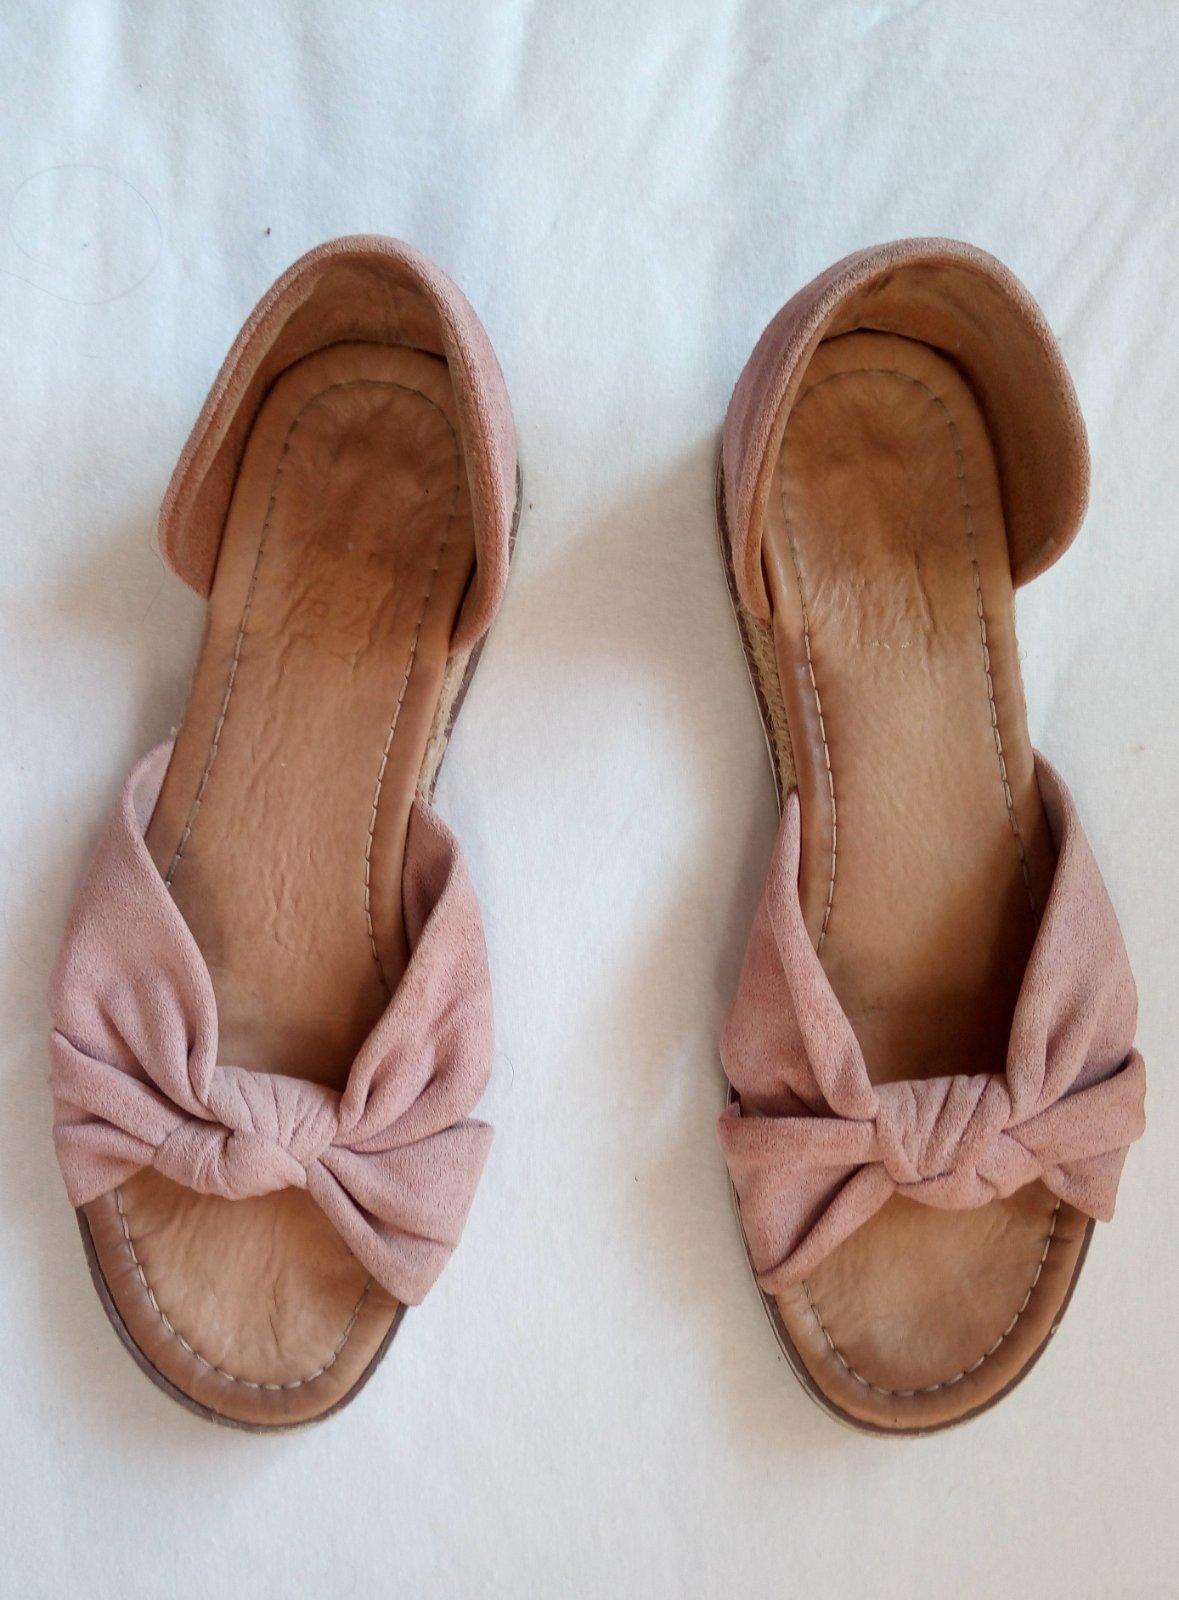 Bledoružové sandálky 38 - Obrázok č. 1